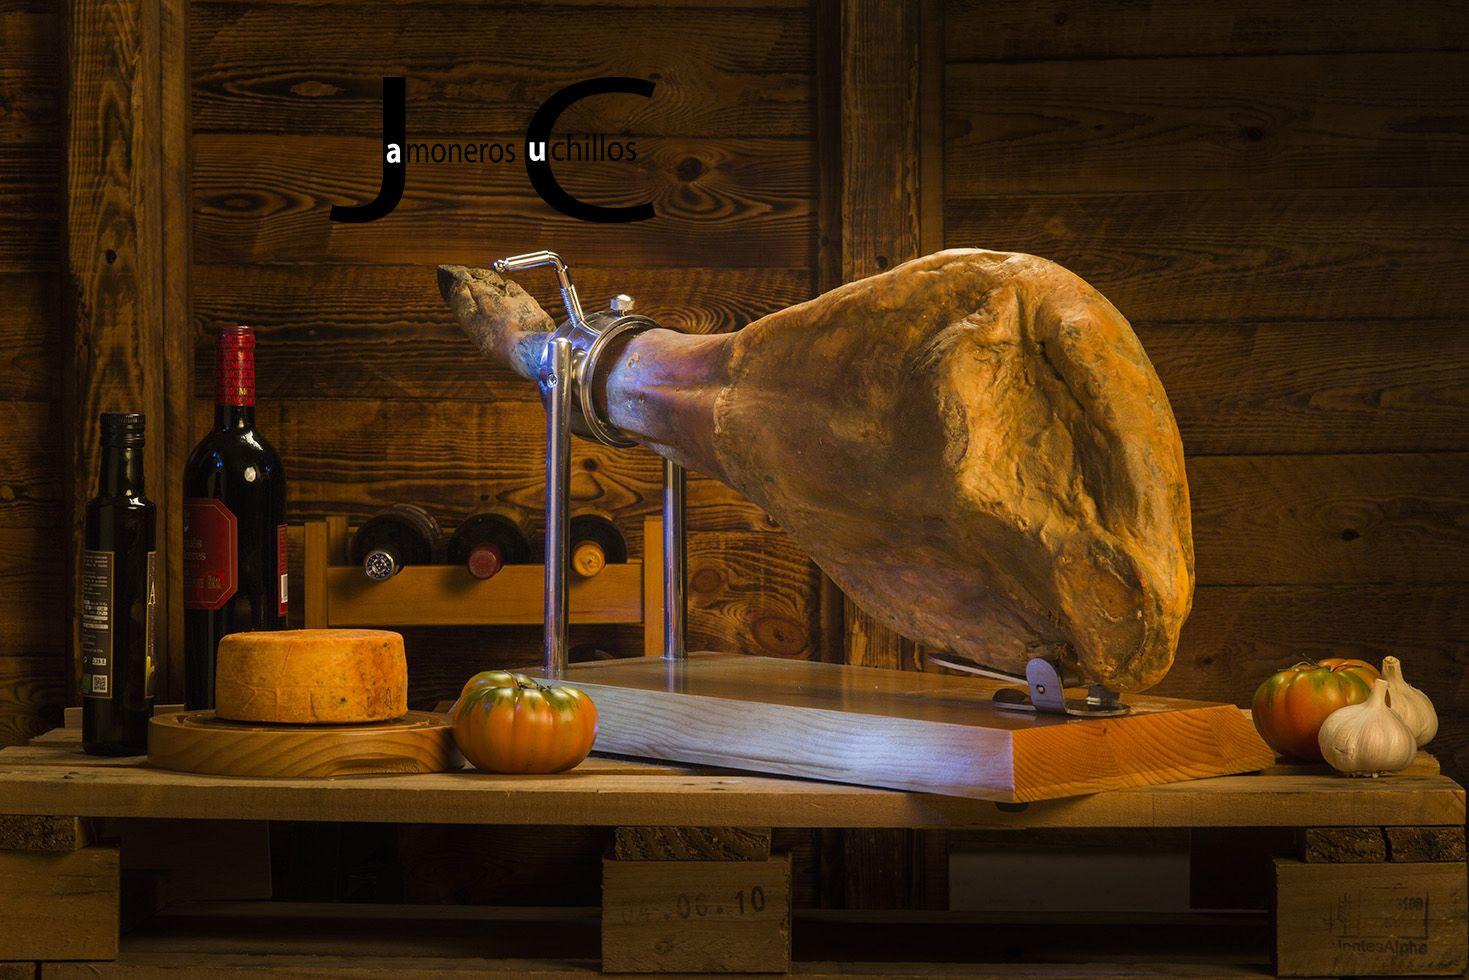 Jamonero giratorio serie 5 madera jamoneros y cuchillos for Cuchillo descortezador